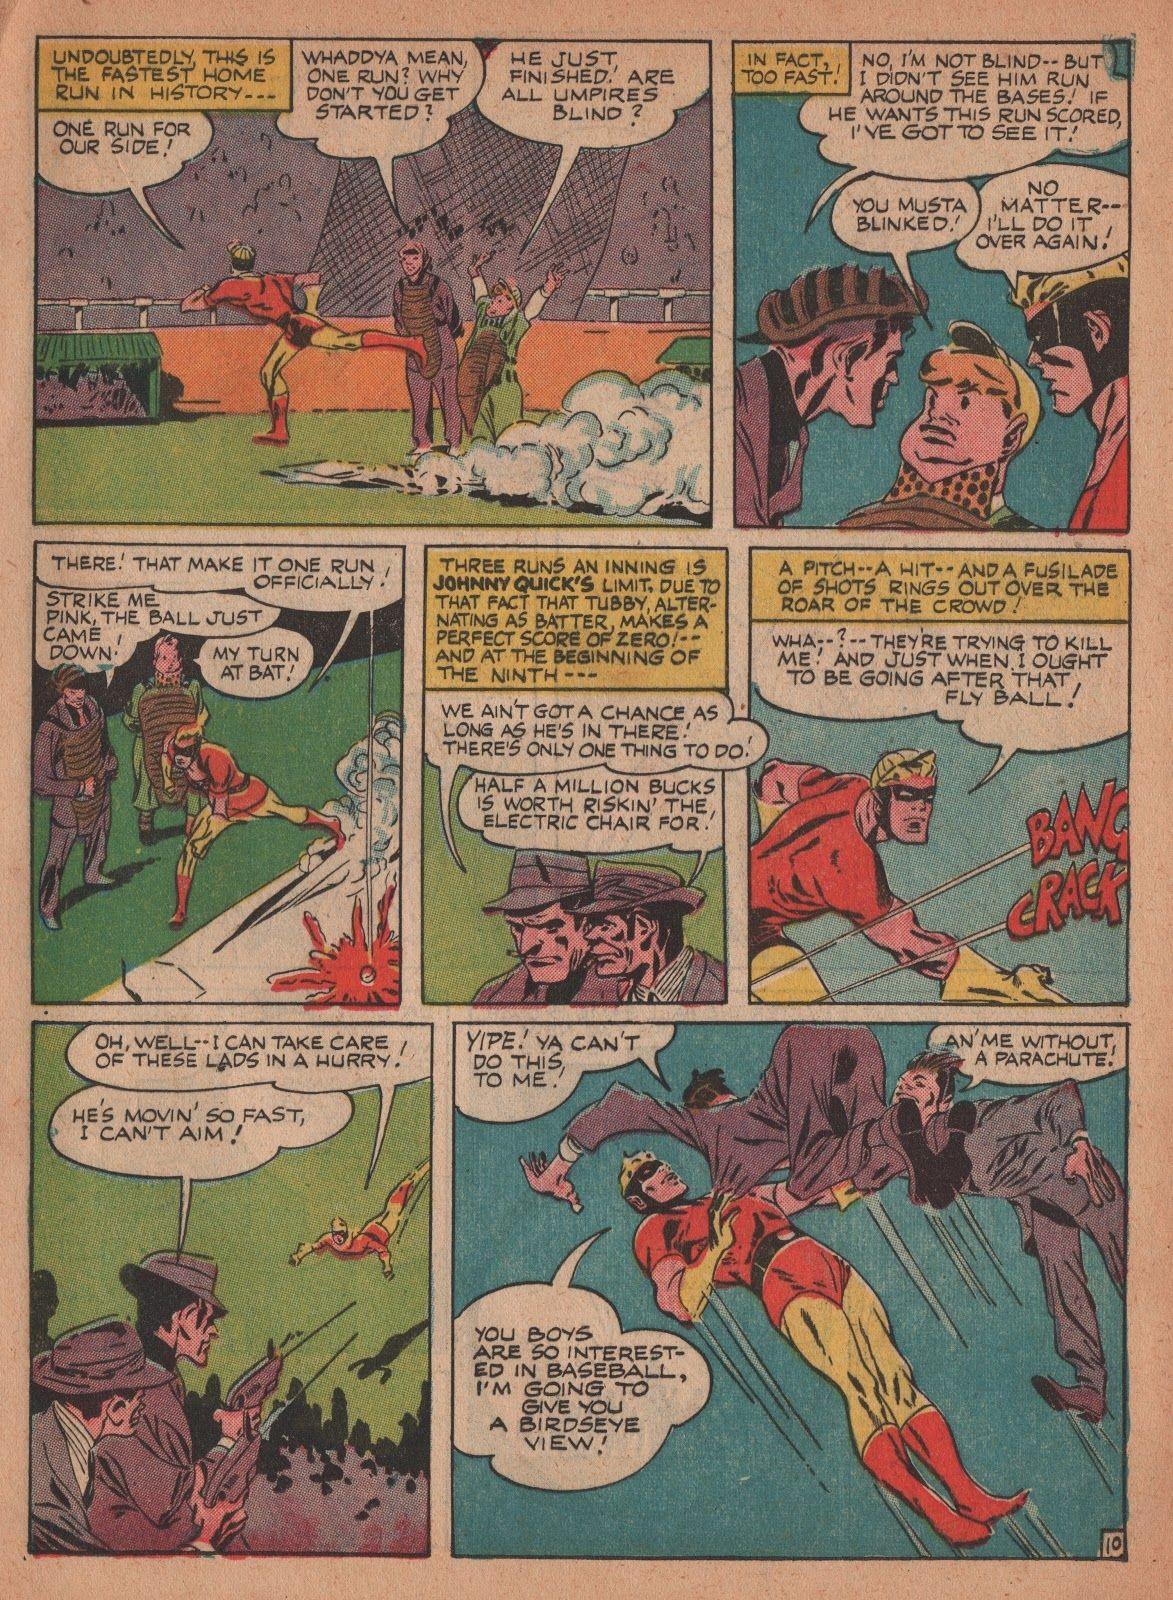 Johnny Quick DC ics